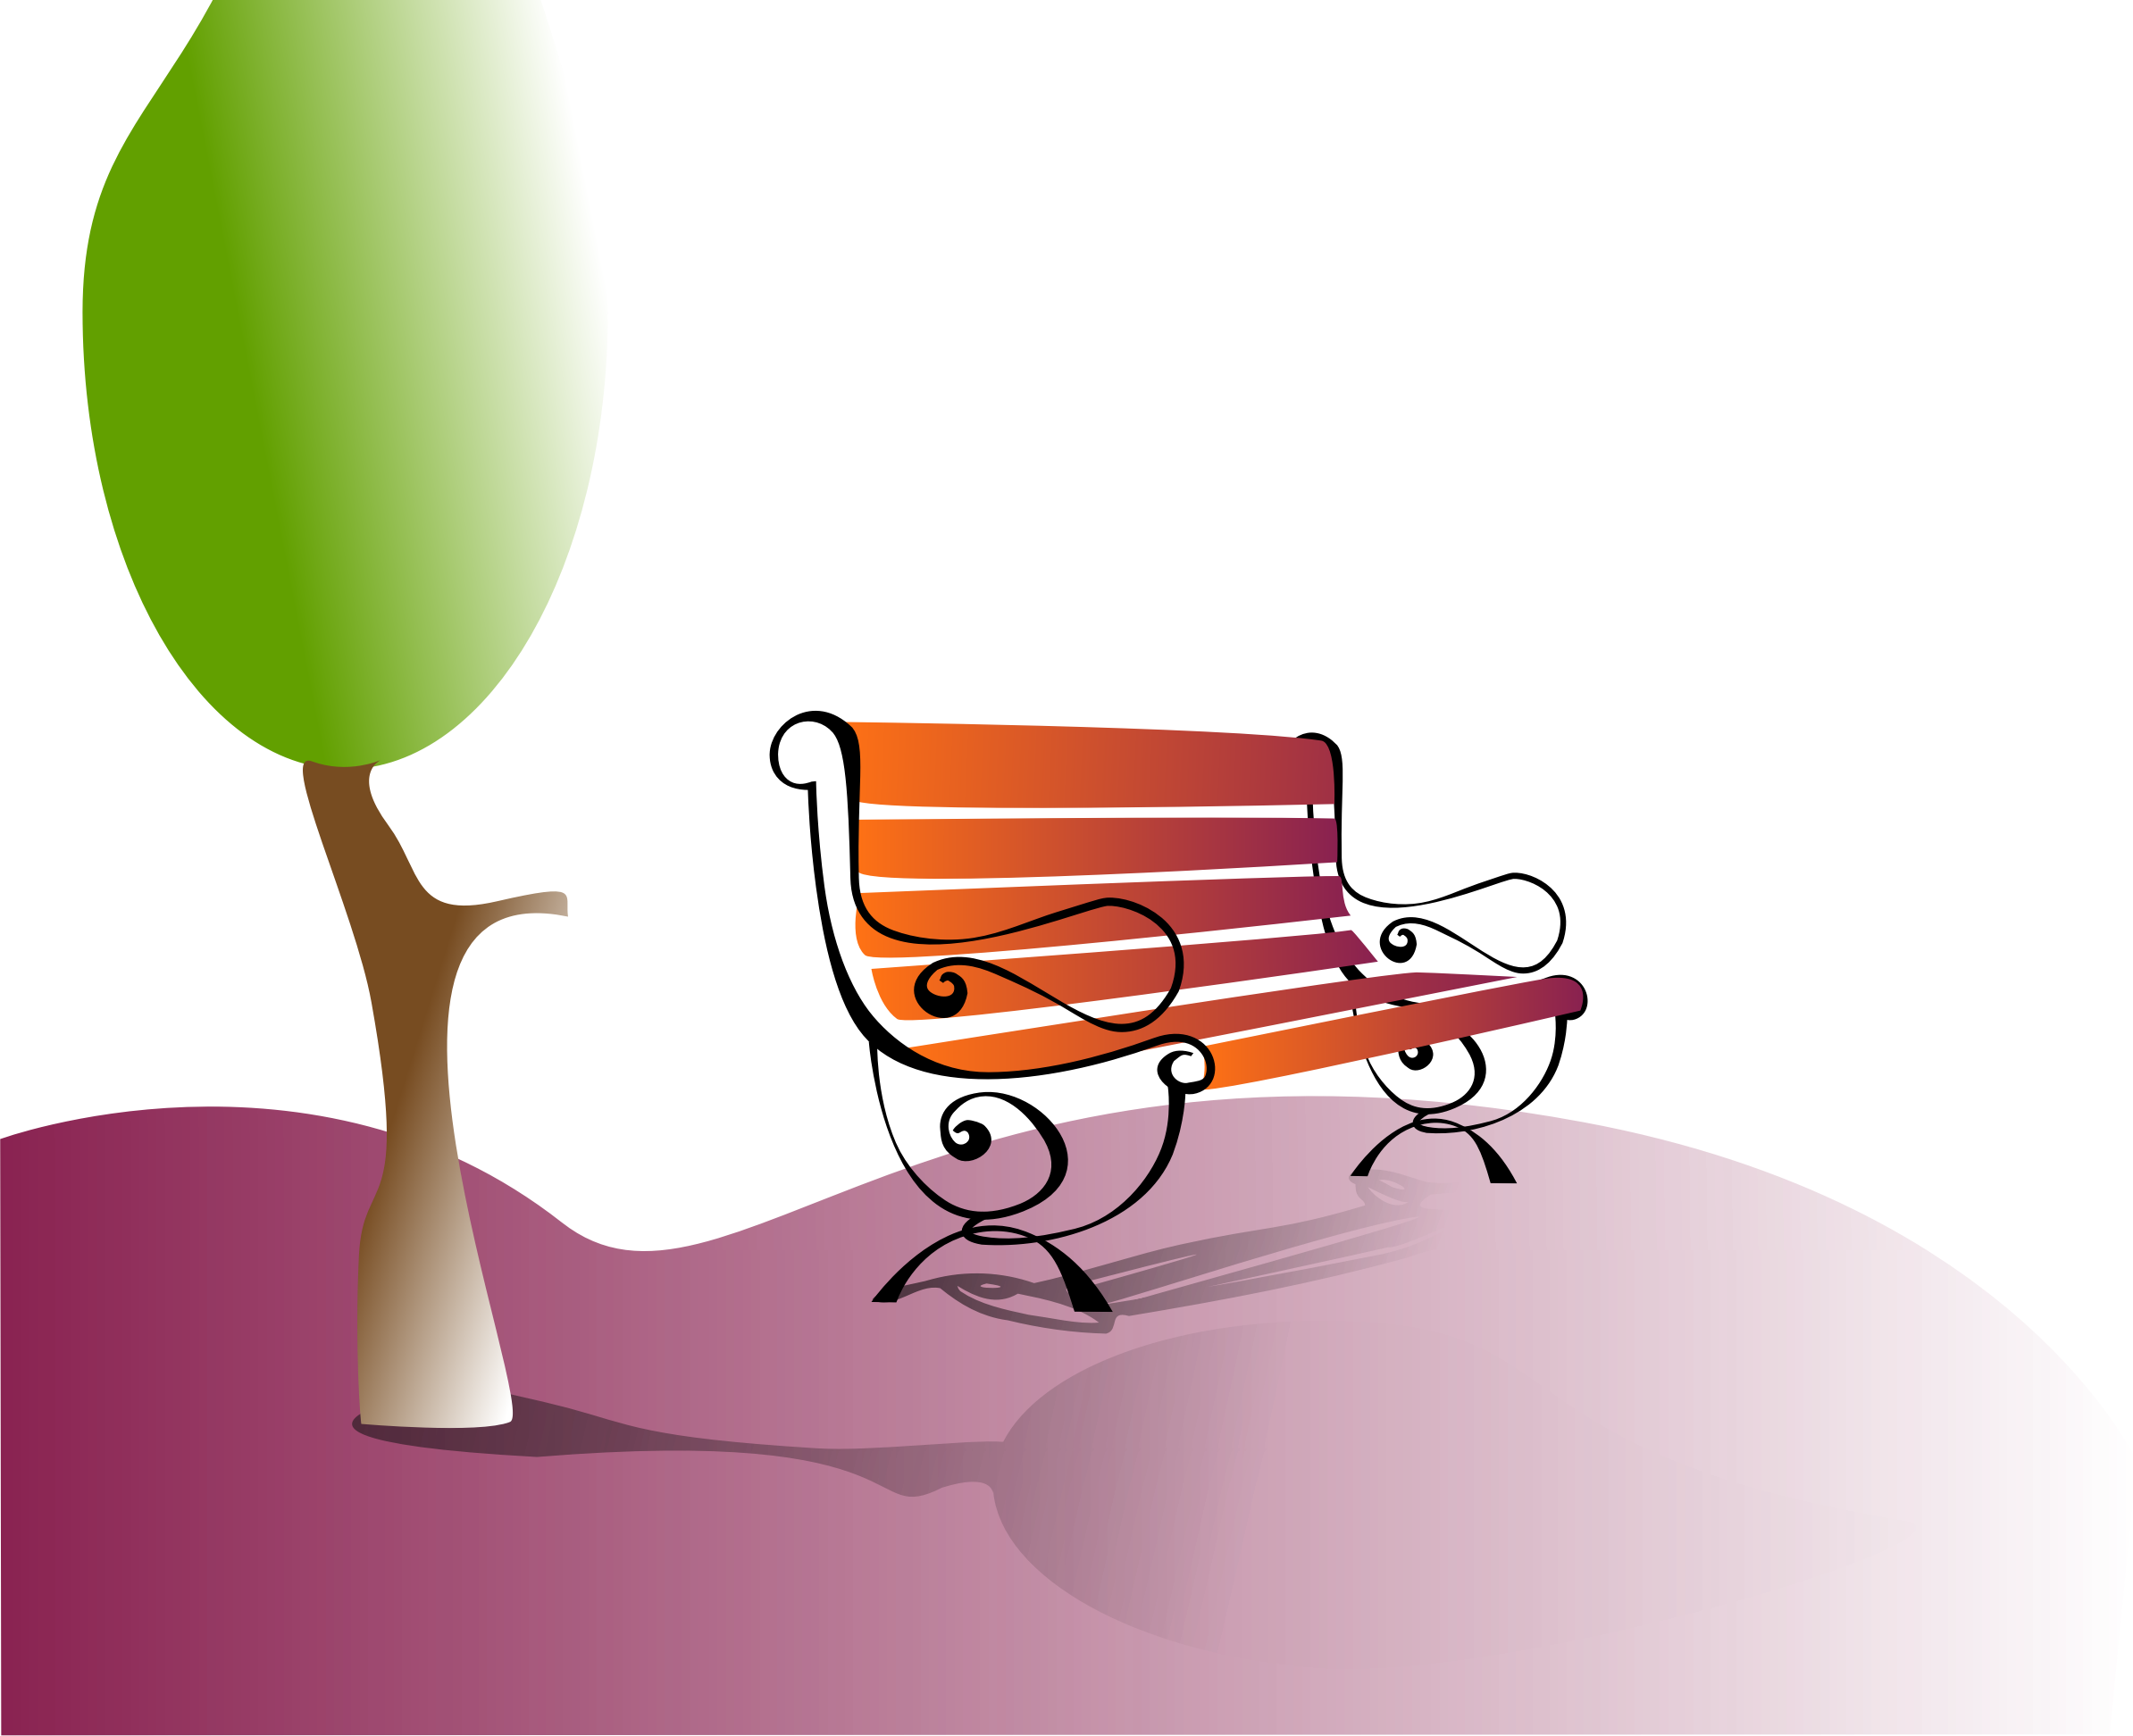 Clipart park bench clipart. Best places to meet